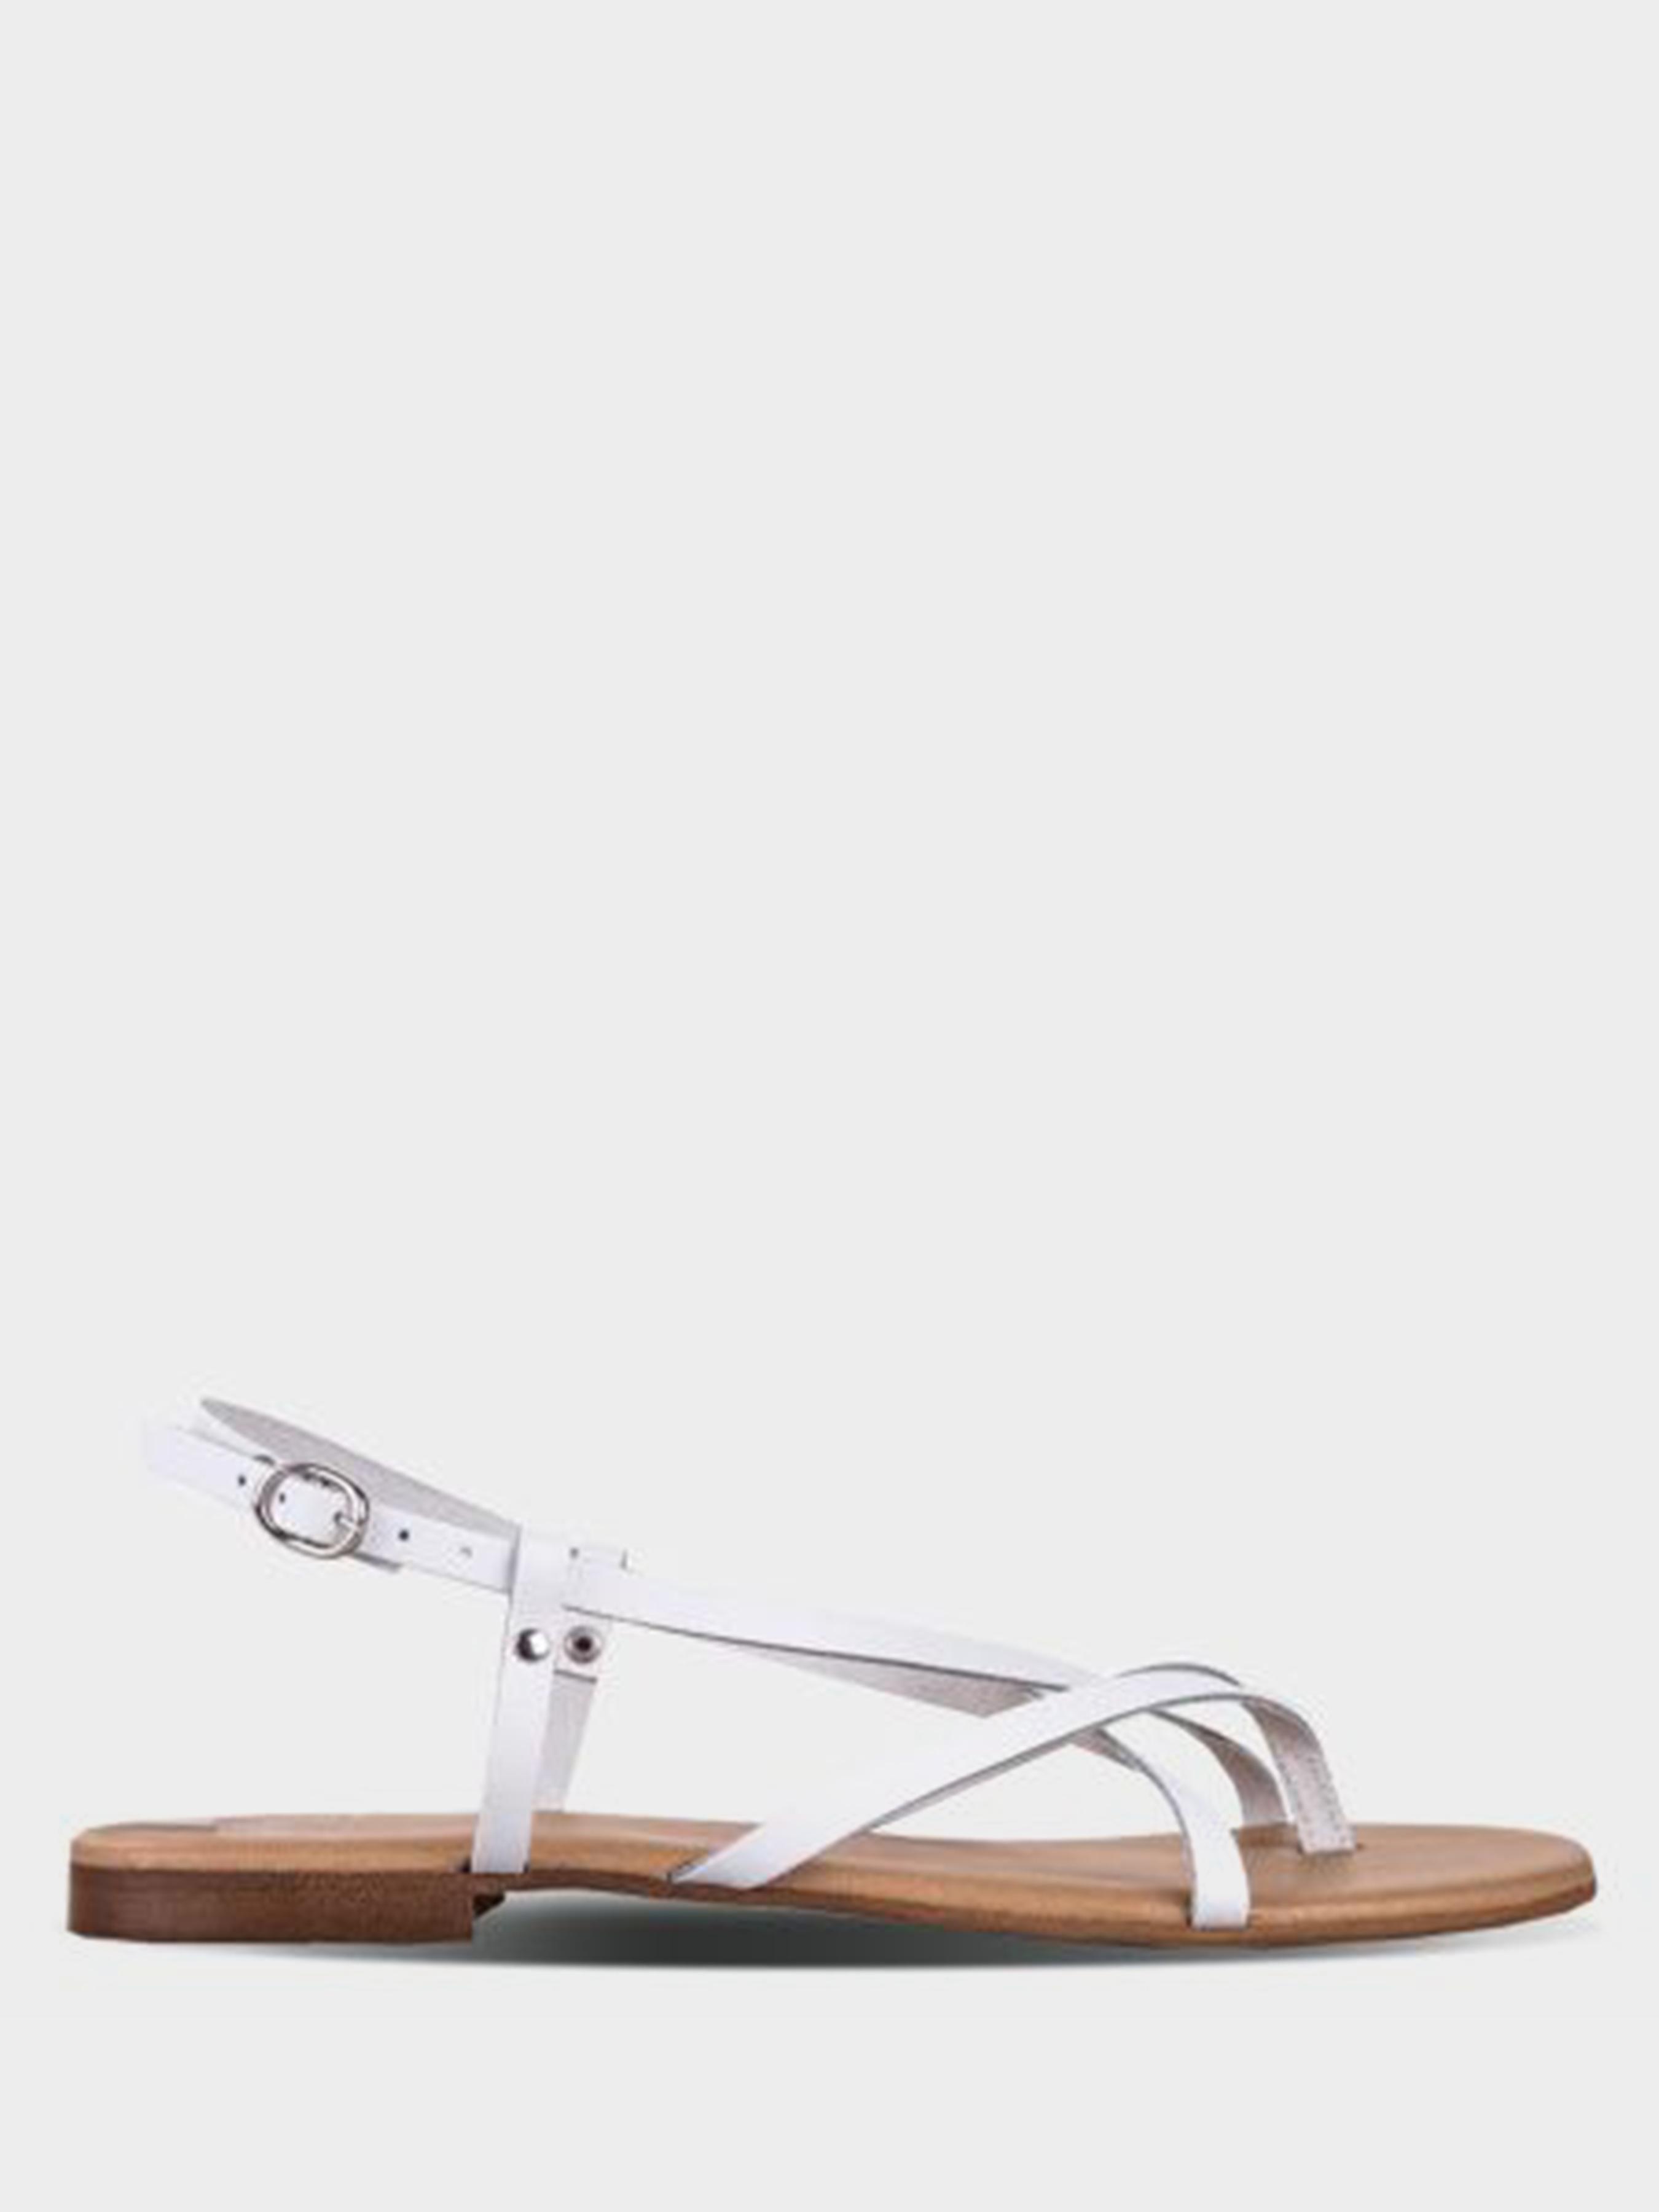 Сандалии для женщин Casta & Dolly 1Z59 модная обувь, 2017